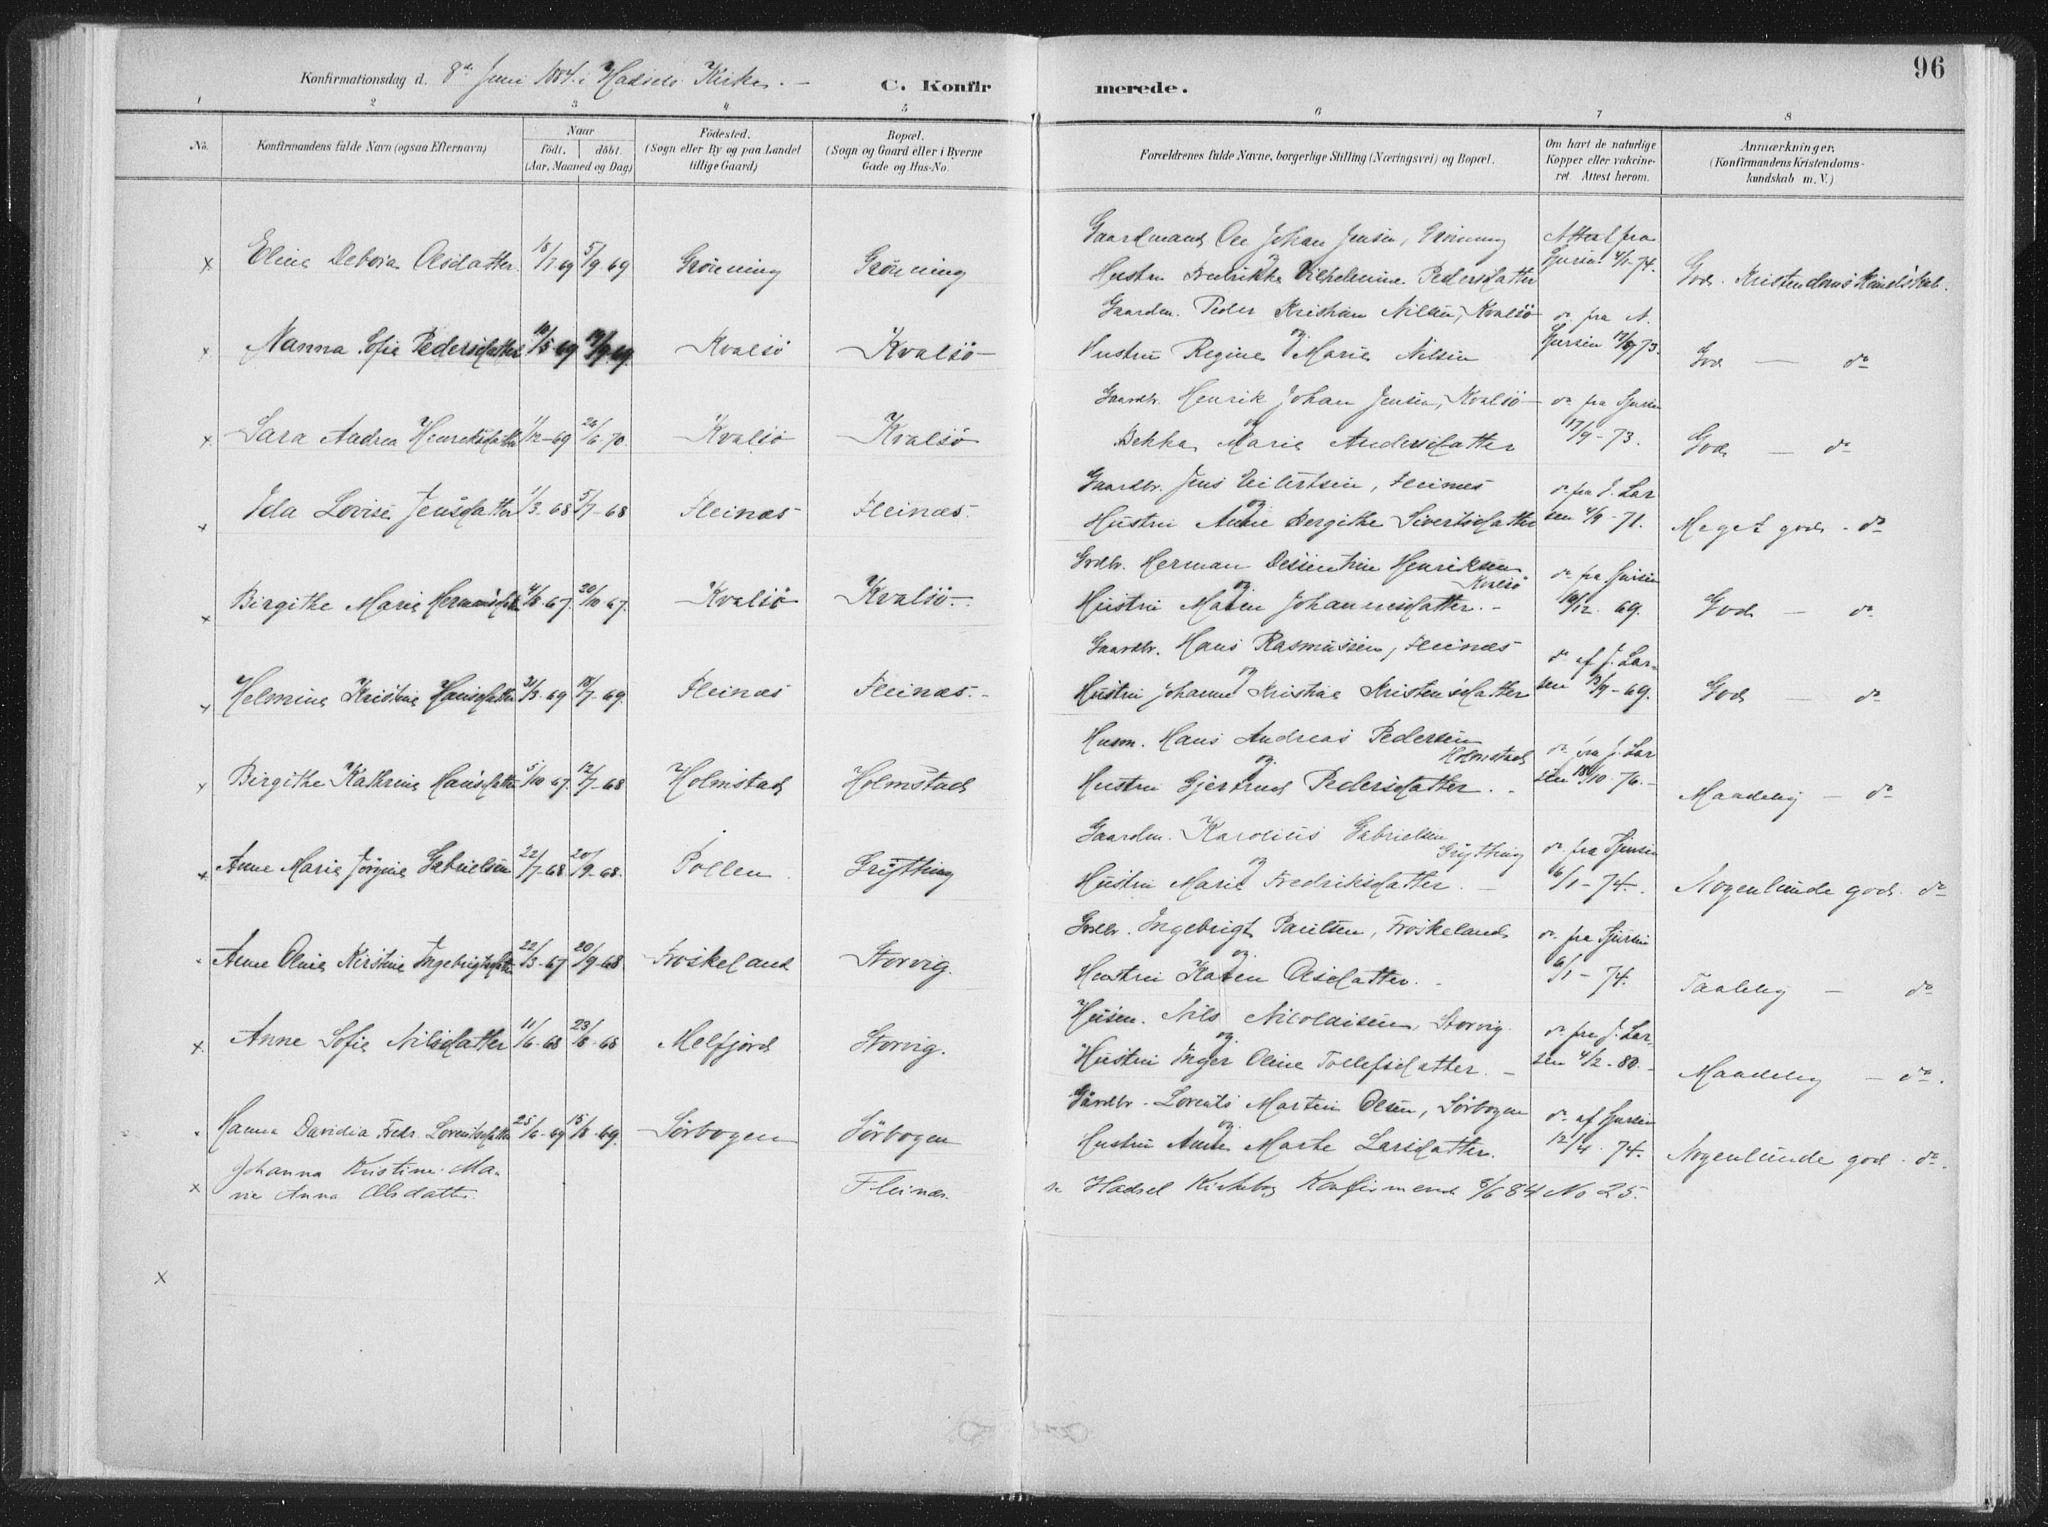 SAT, Ministerialprotokoller, klokkerbøker og fødselsregistre - Nordland, 890/L1286: Ministerialbok nr. 890A01, 1882-1902, s. 96